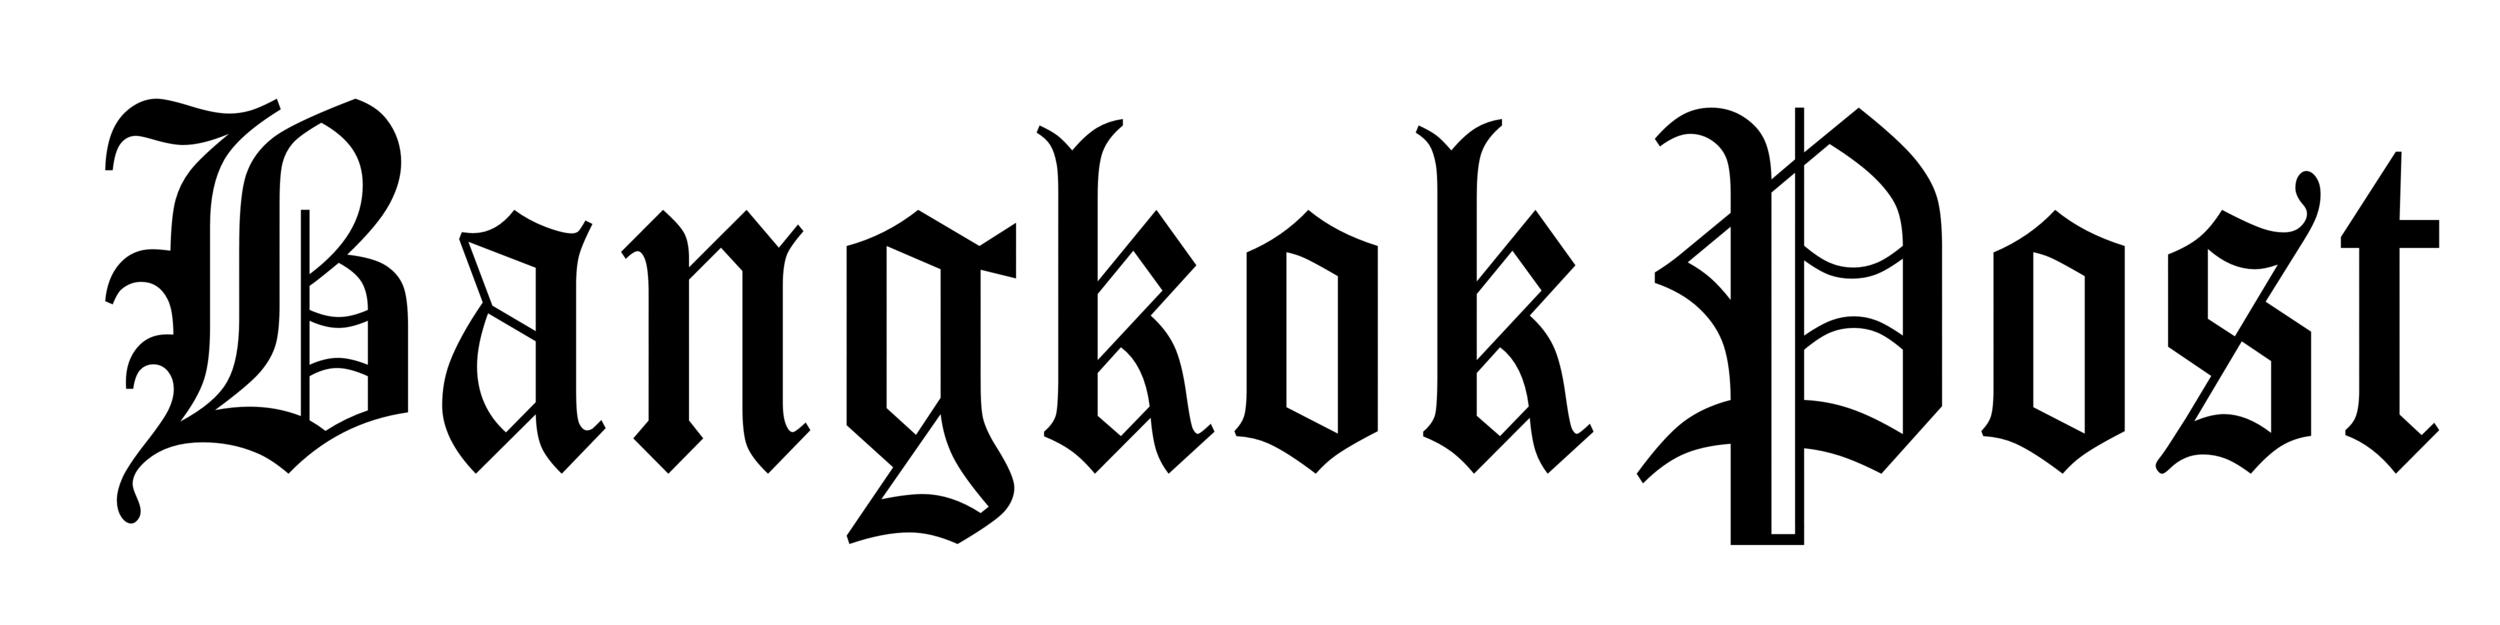 Bangkok_Post_logo_white_bg.png